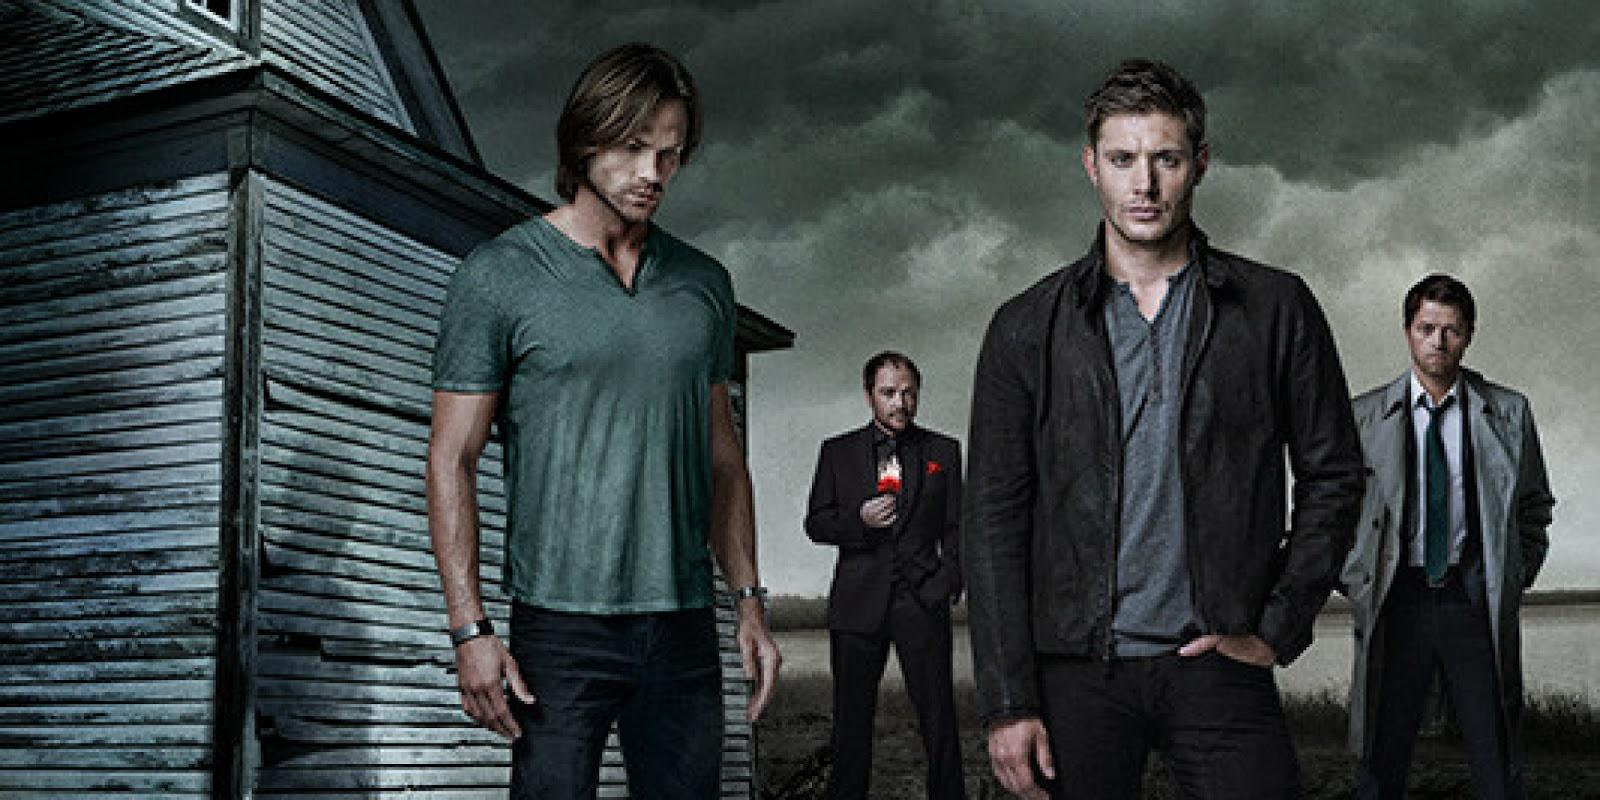 supernatural 9x03 series pepito